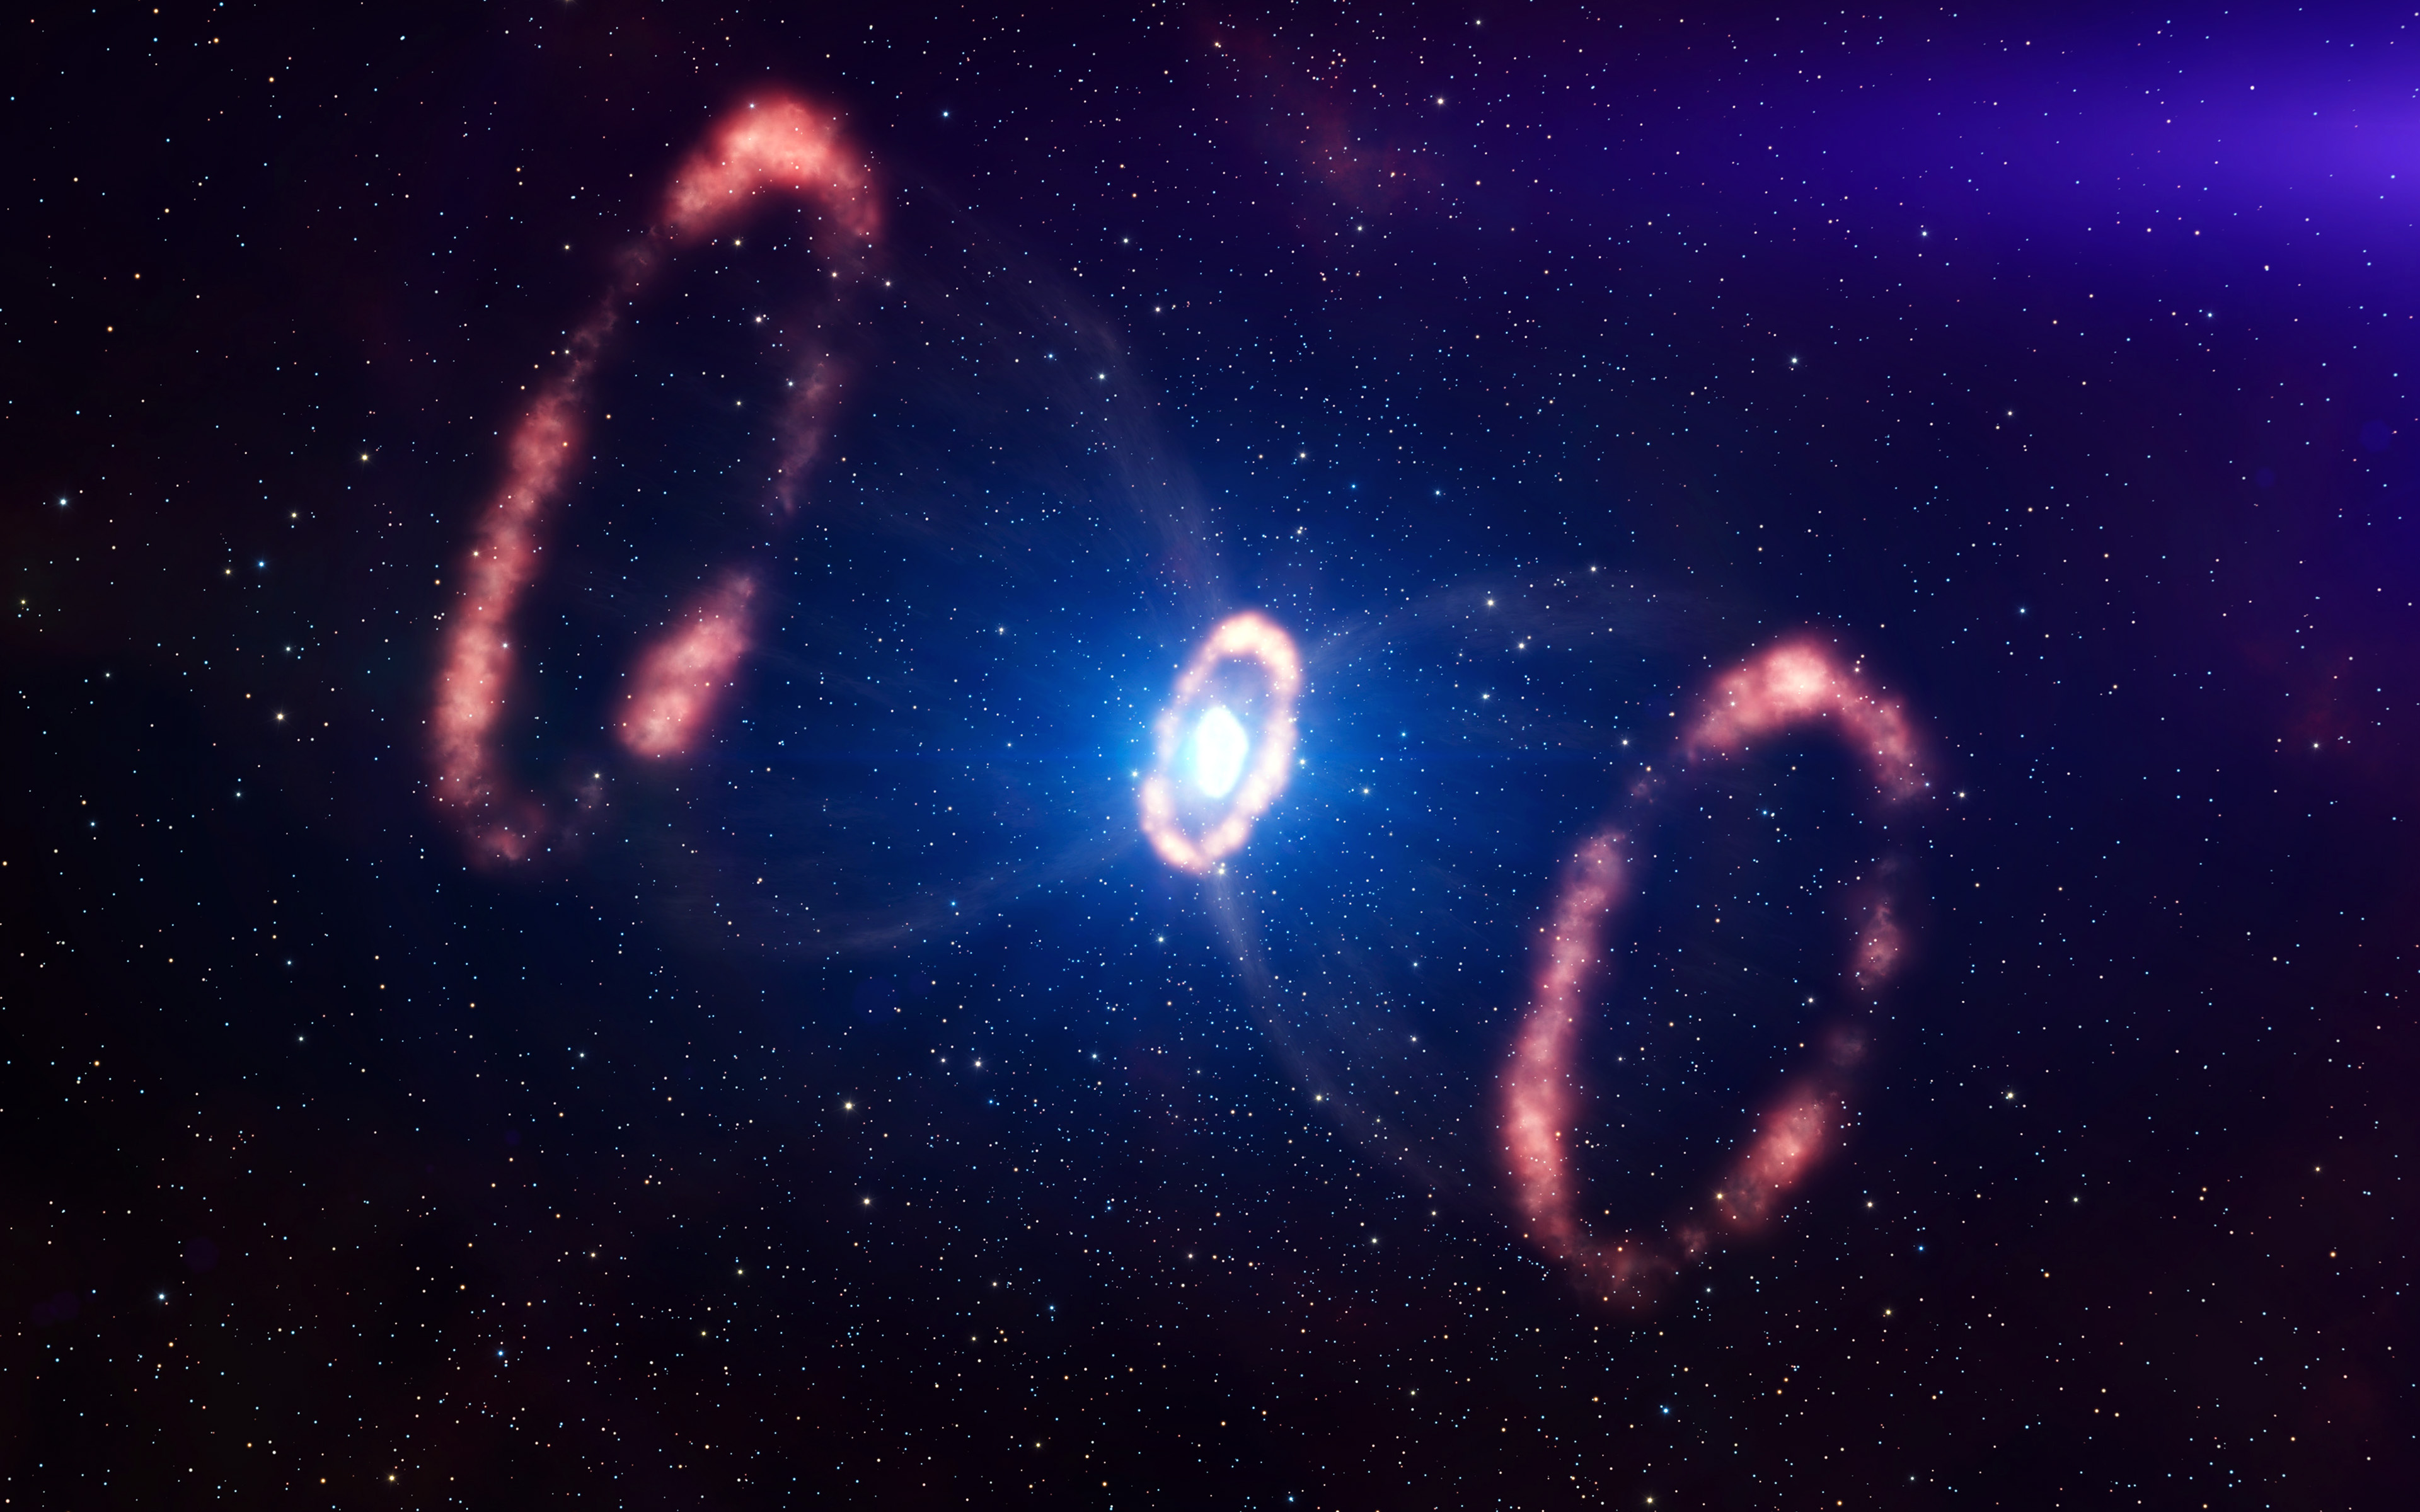 papers.co mt21 space dark sky galaxy night beautiful blue flare 36 3840x2400 4k wallpaper